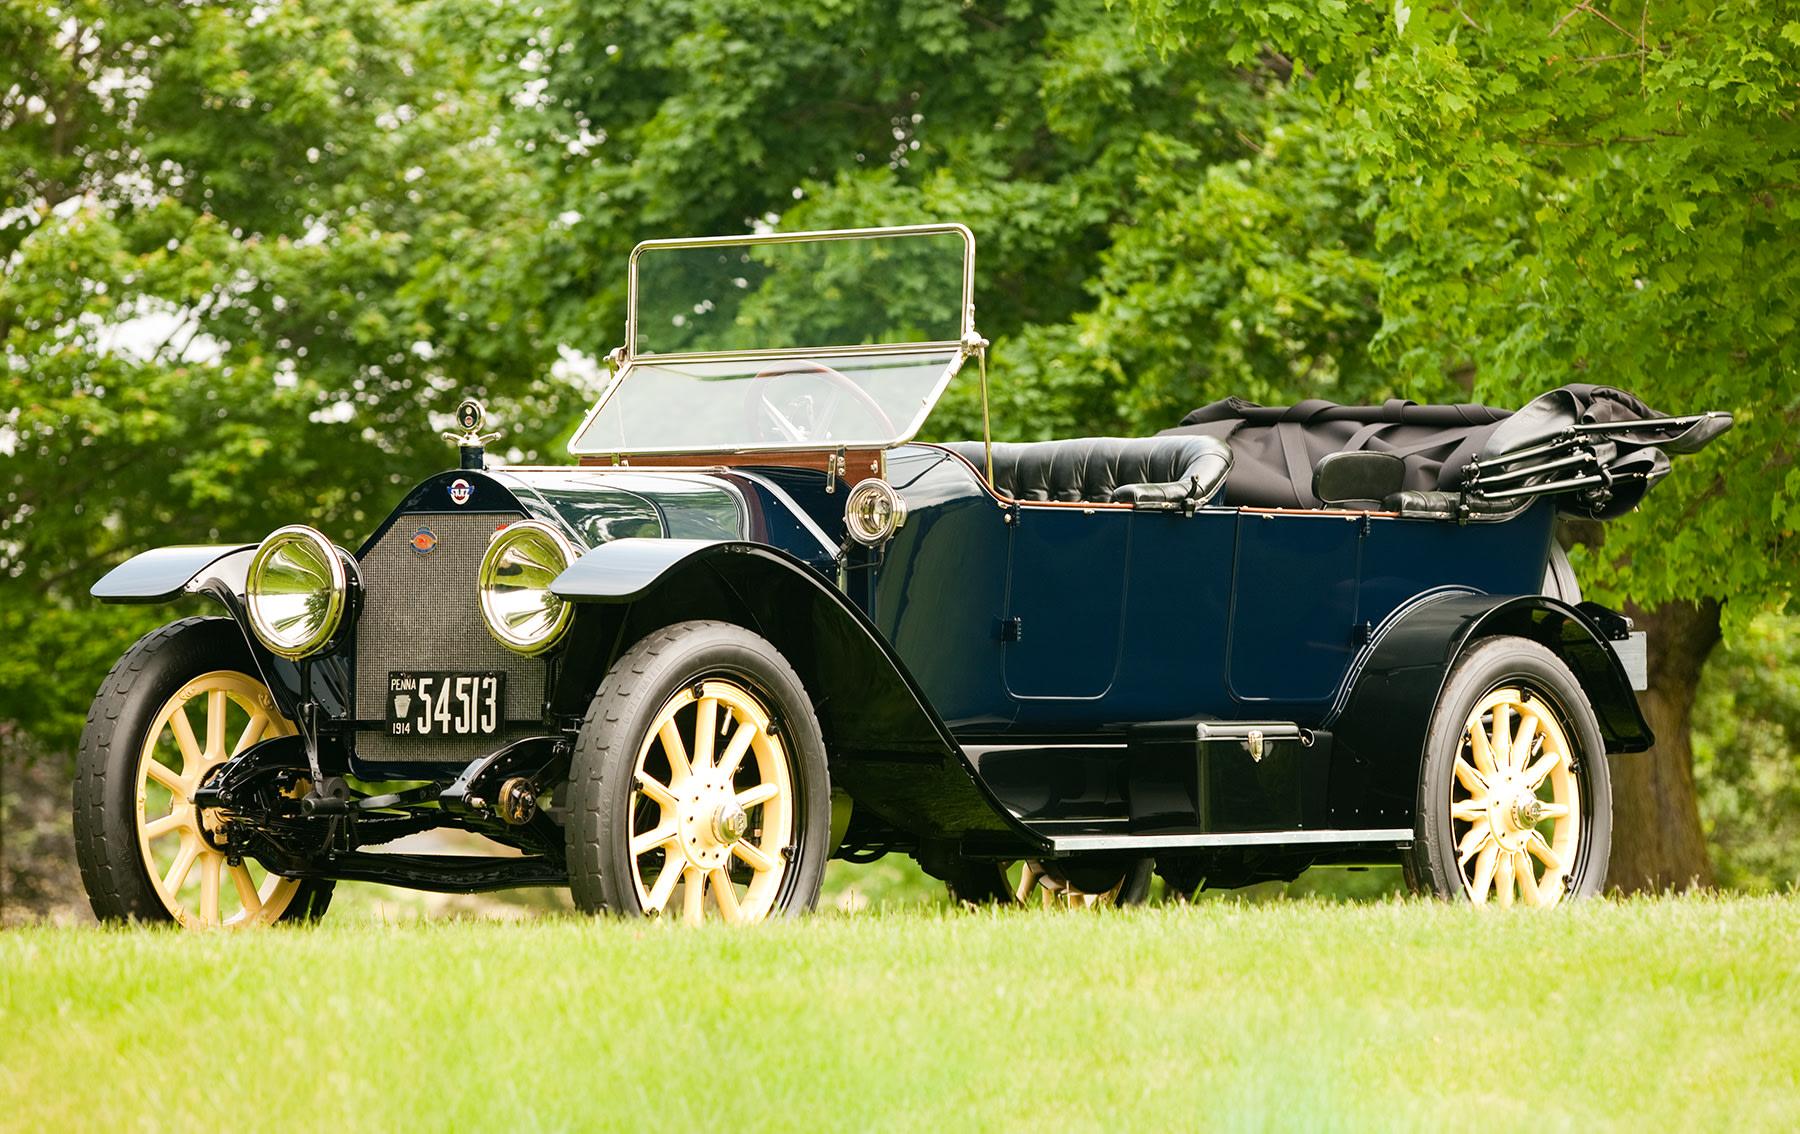 1914 Stutz Model 4E Touring Car